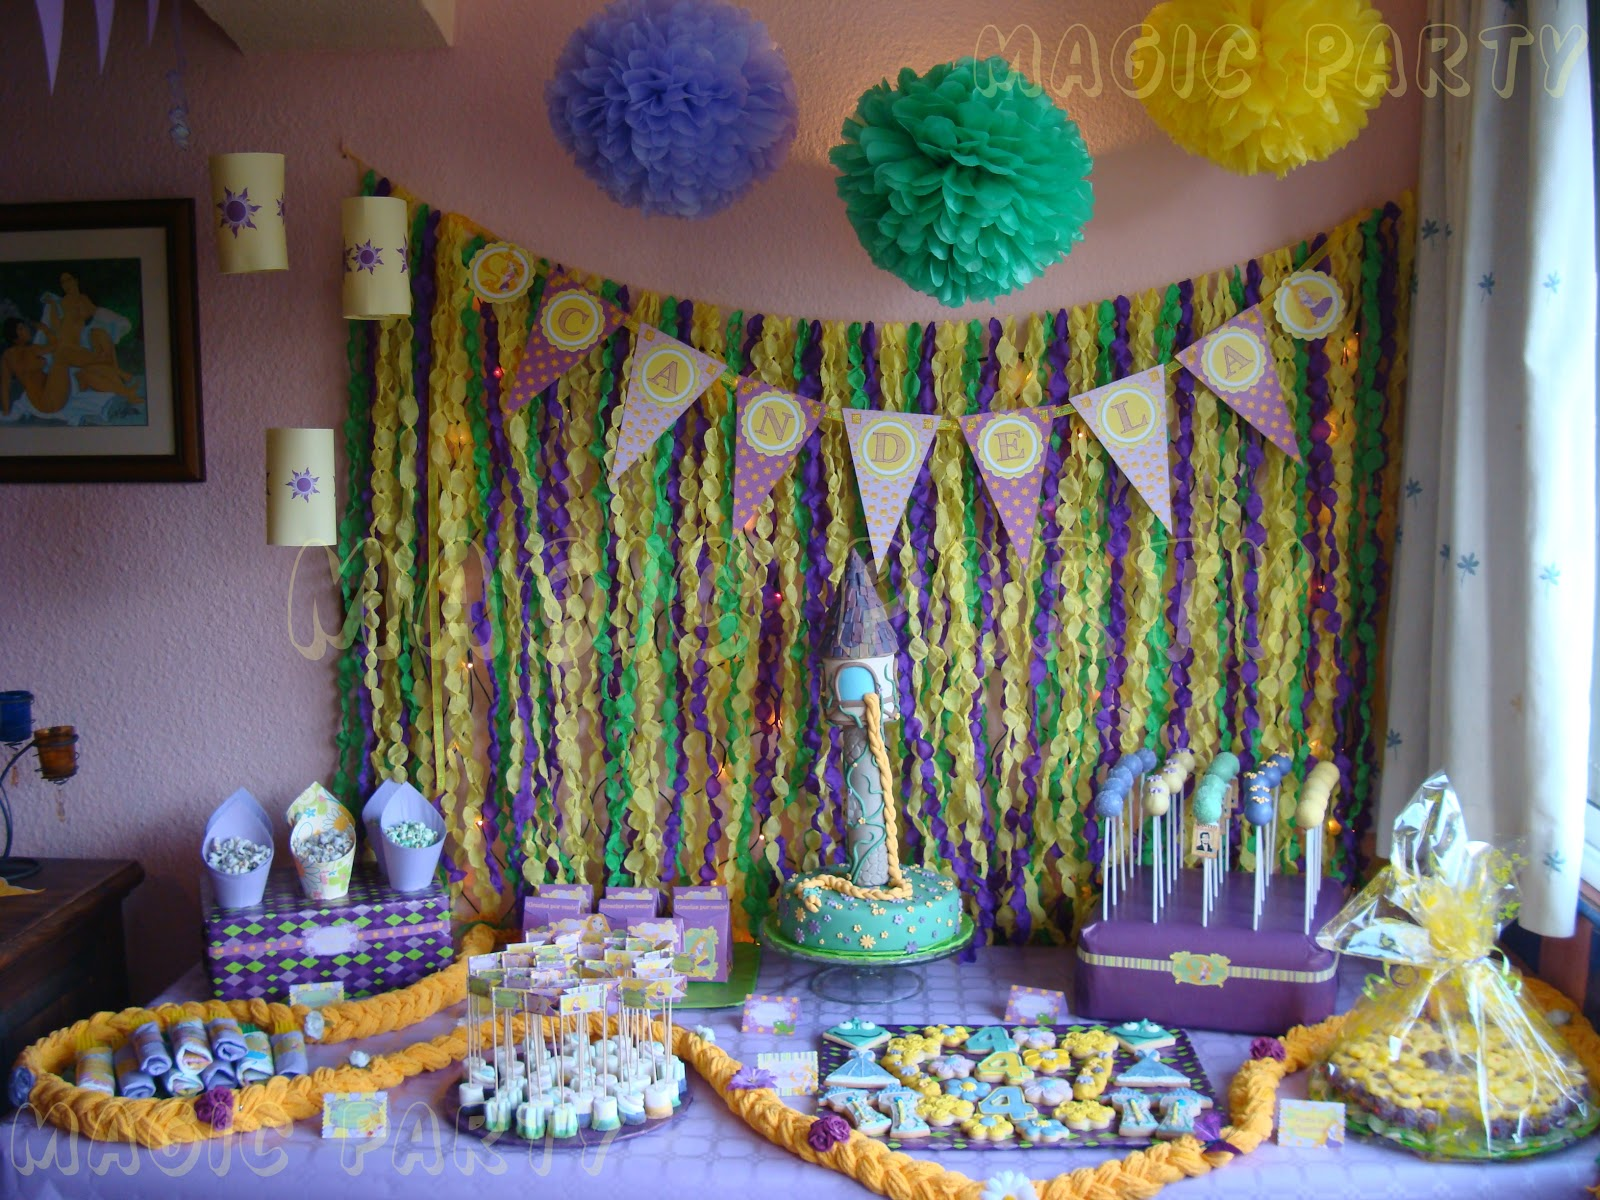 Decoracion rapunzel para fiestas for Adornos de decoracion